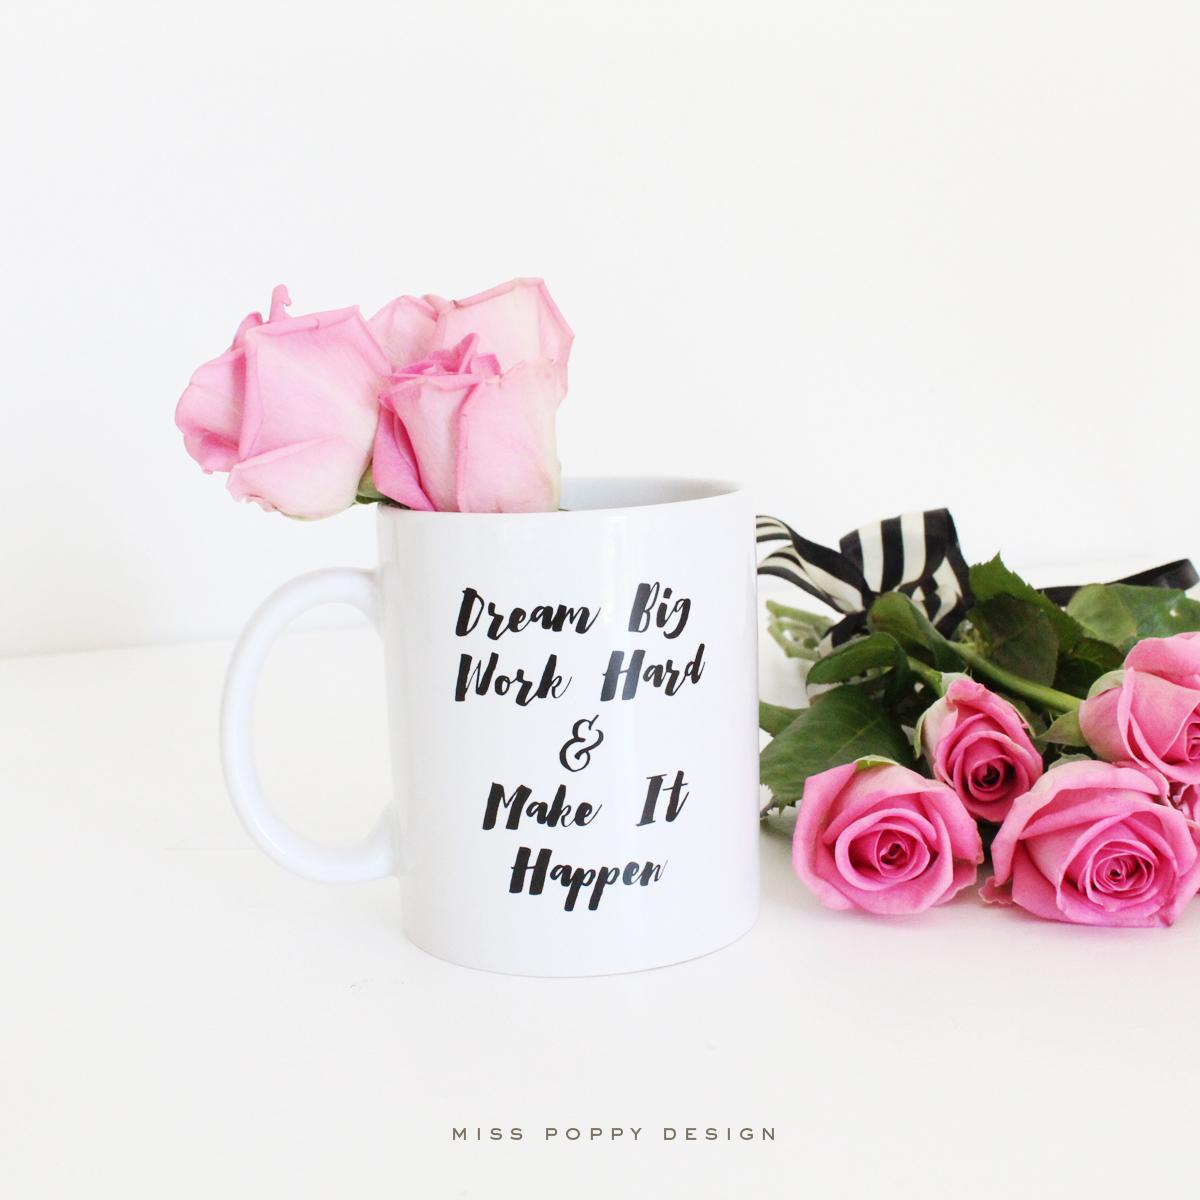 Miss Poppy Design: Dream Big, Work Hard and Make It Happen Coffee Mug available from www.misspoppydesign.com